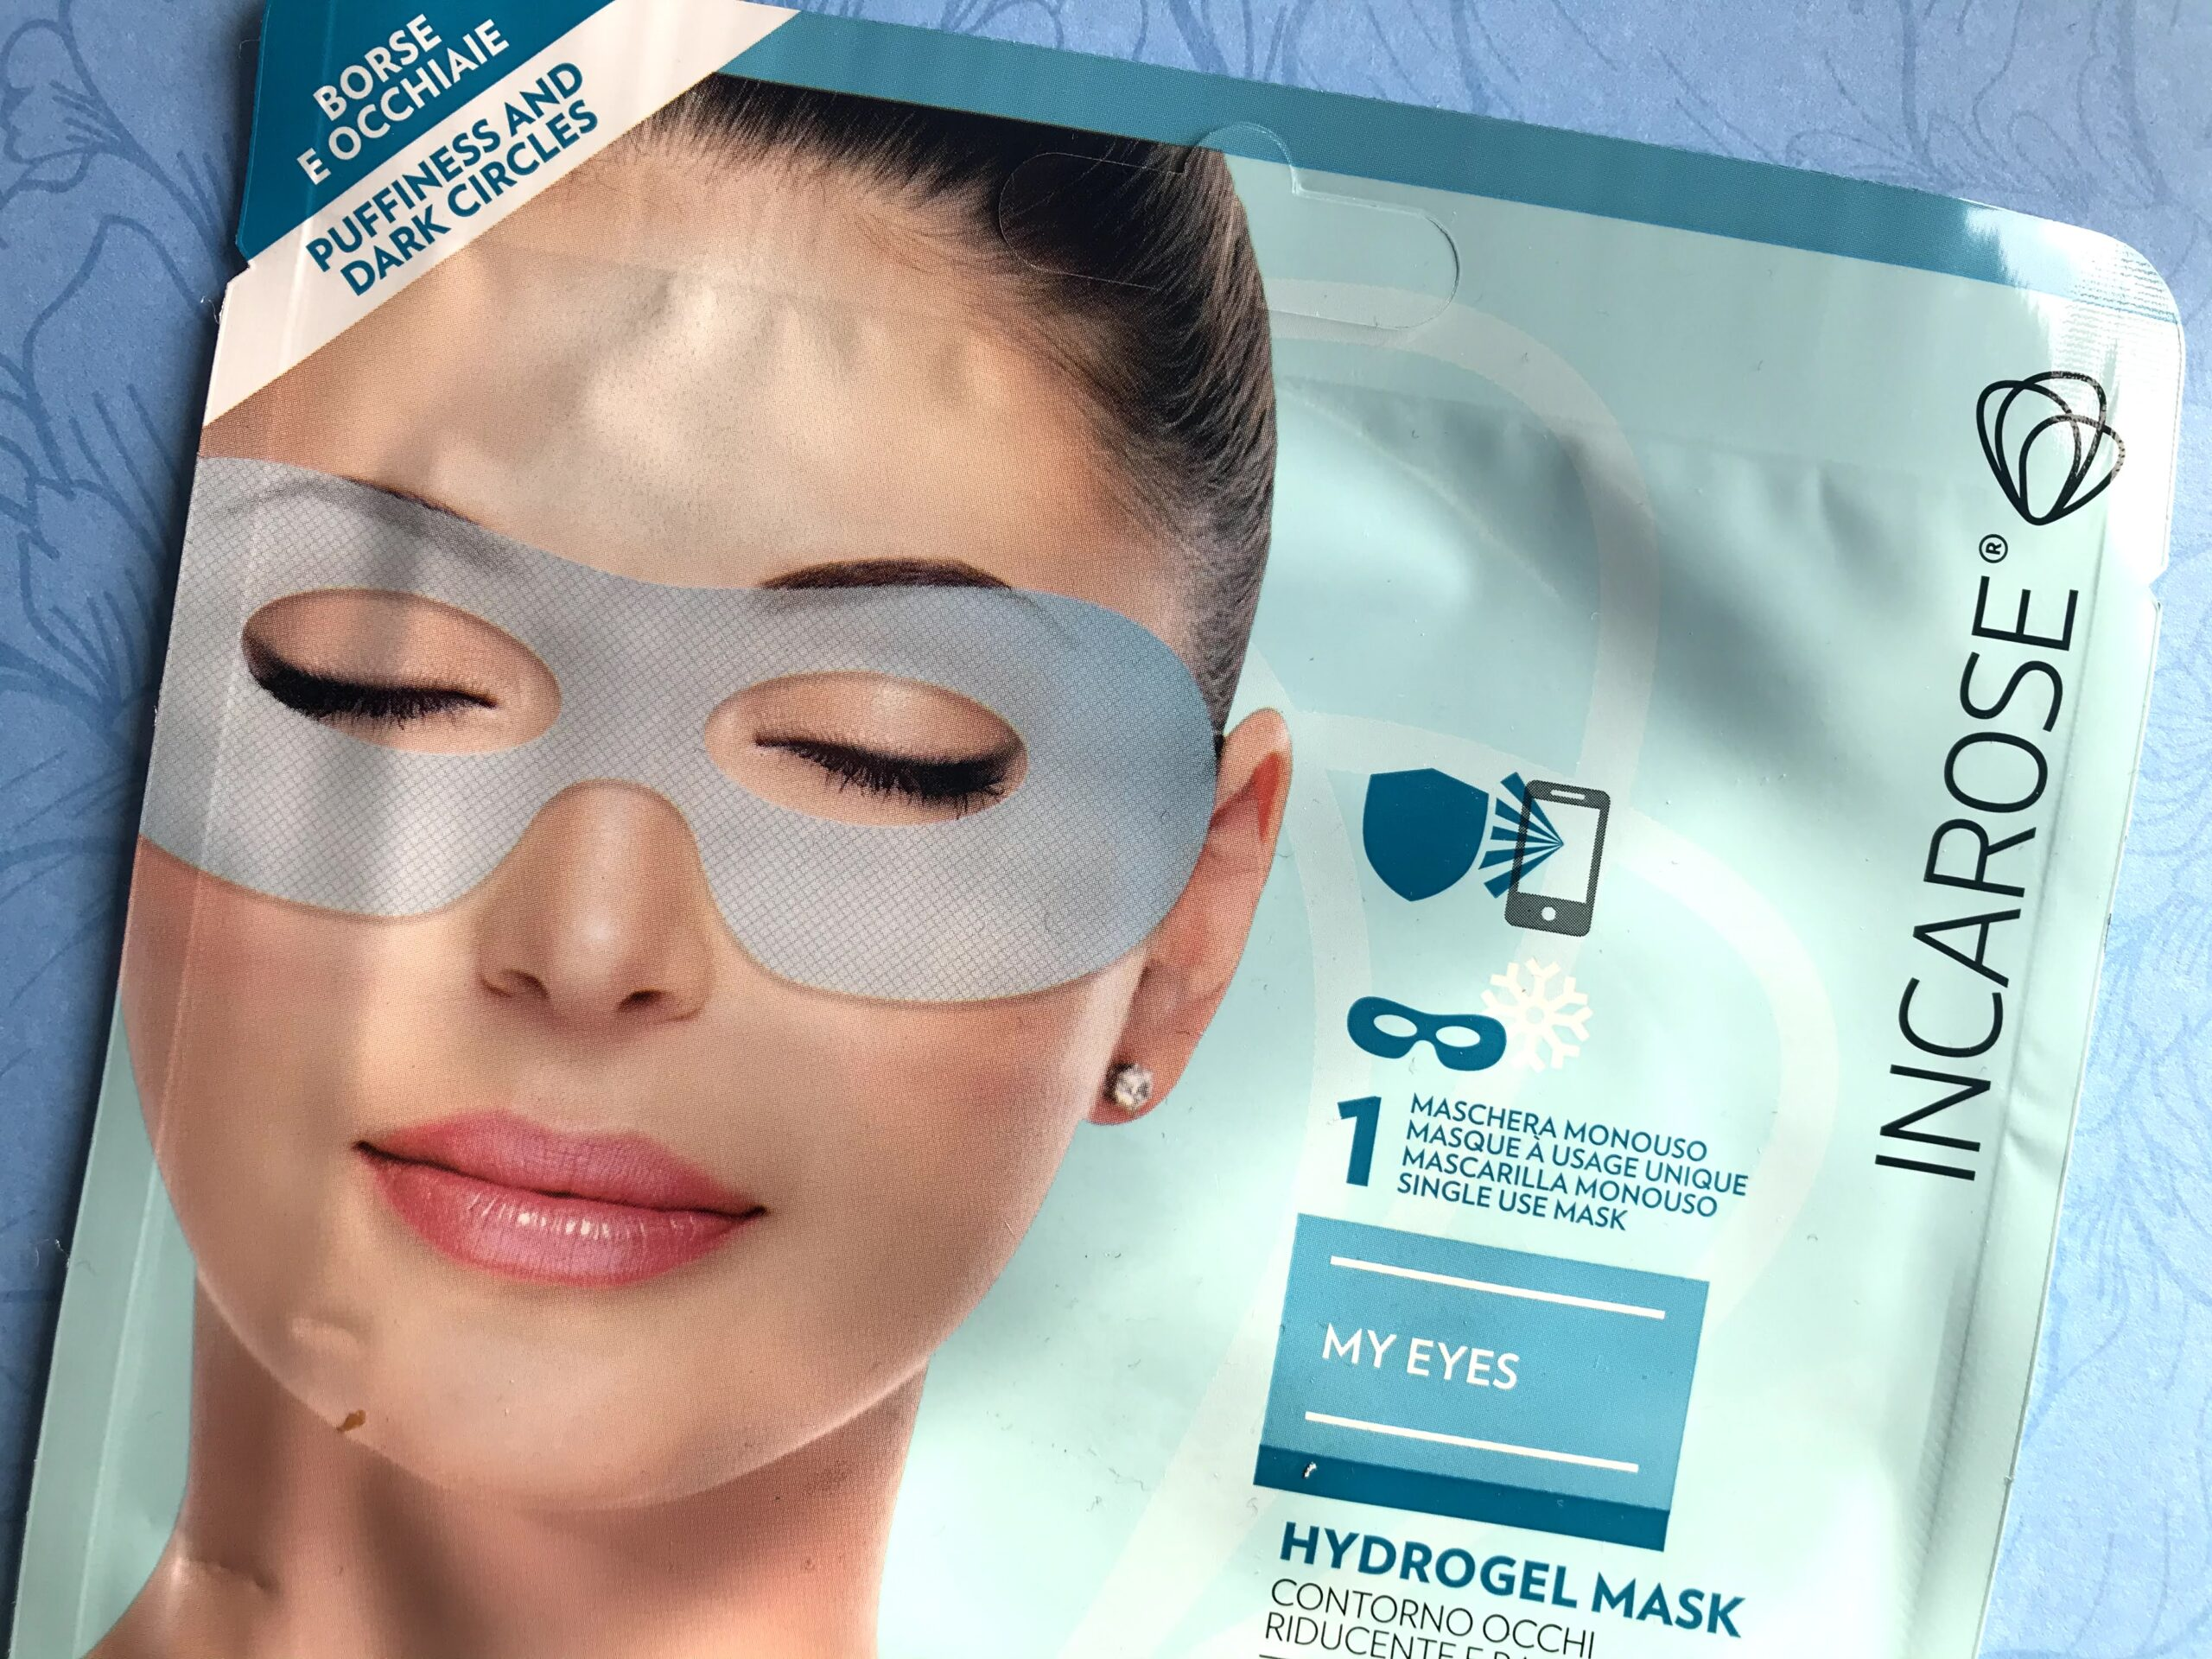 incarose hydrogel mask